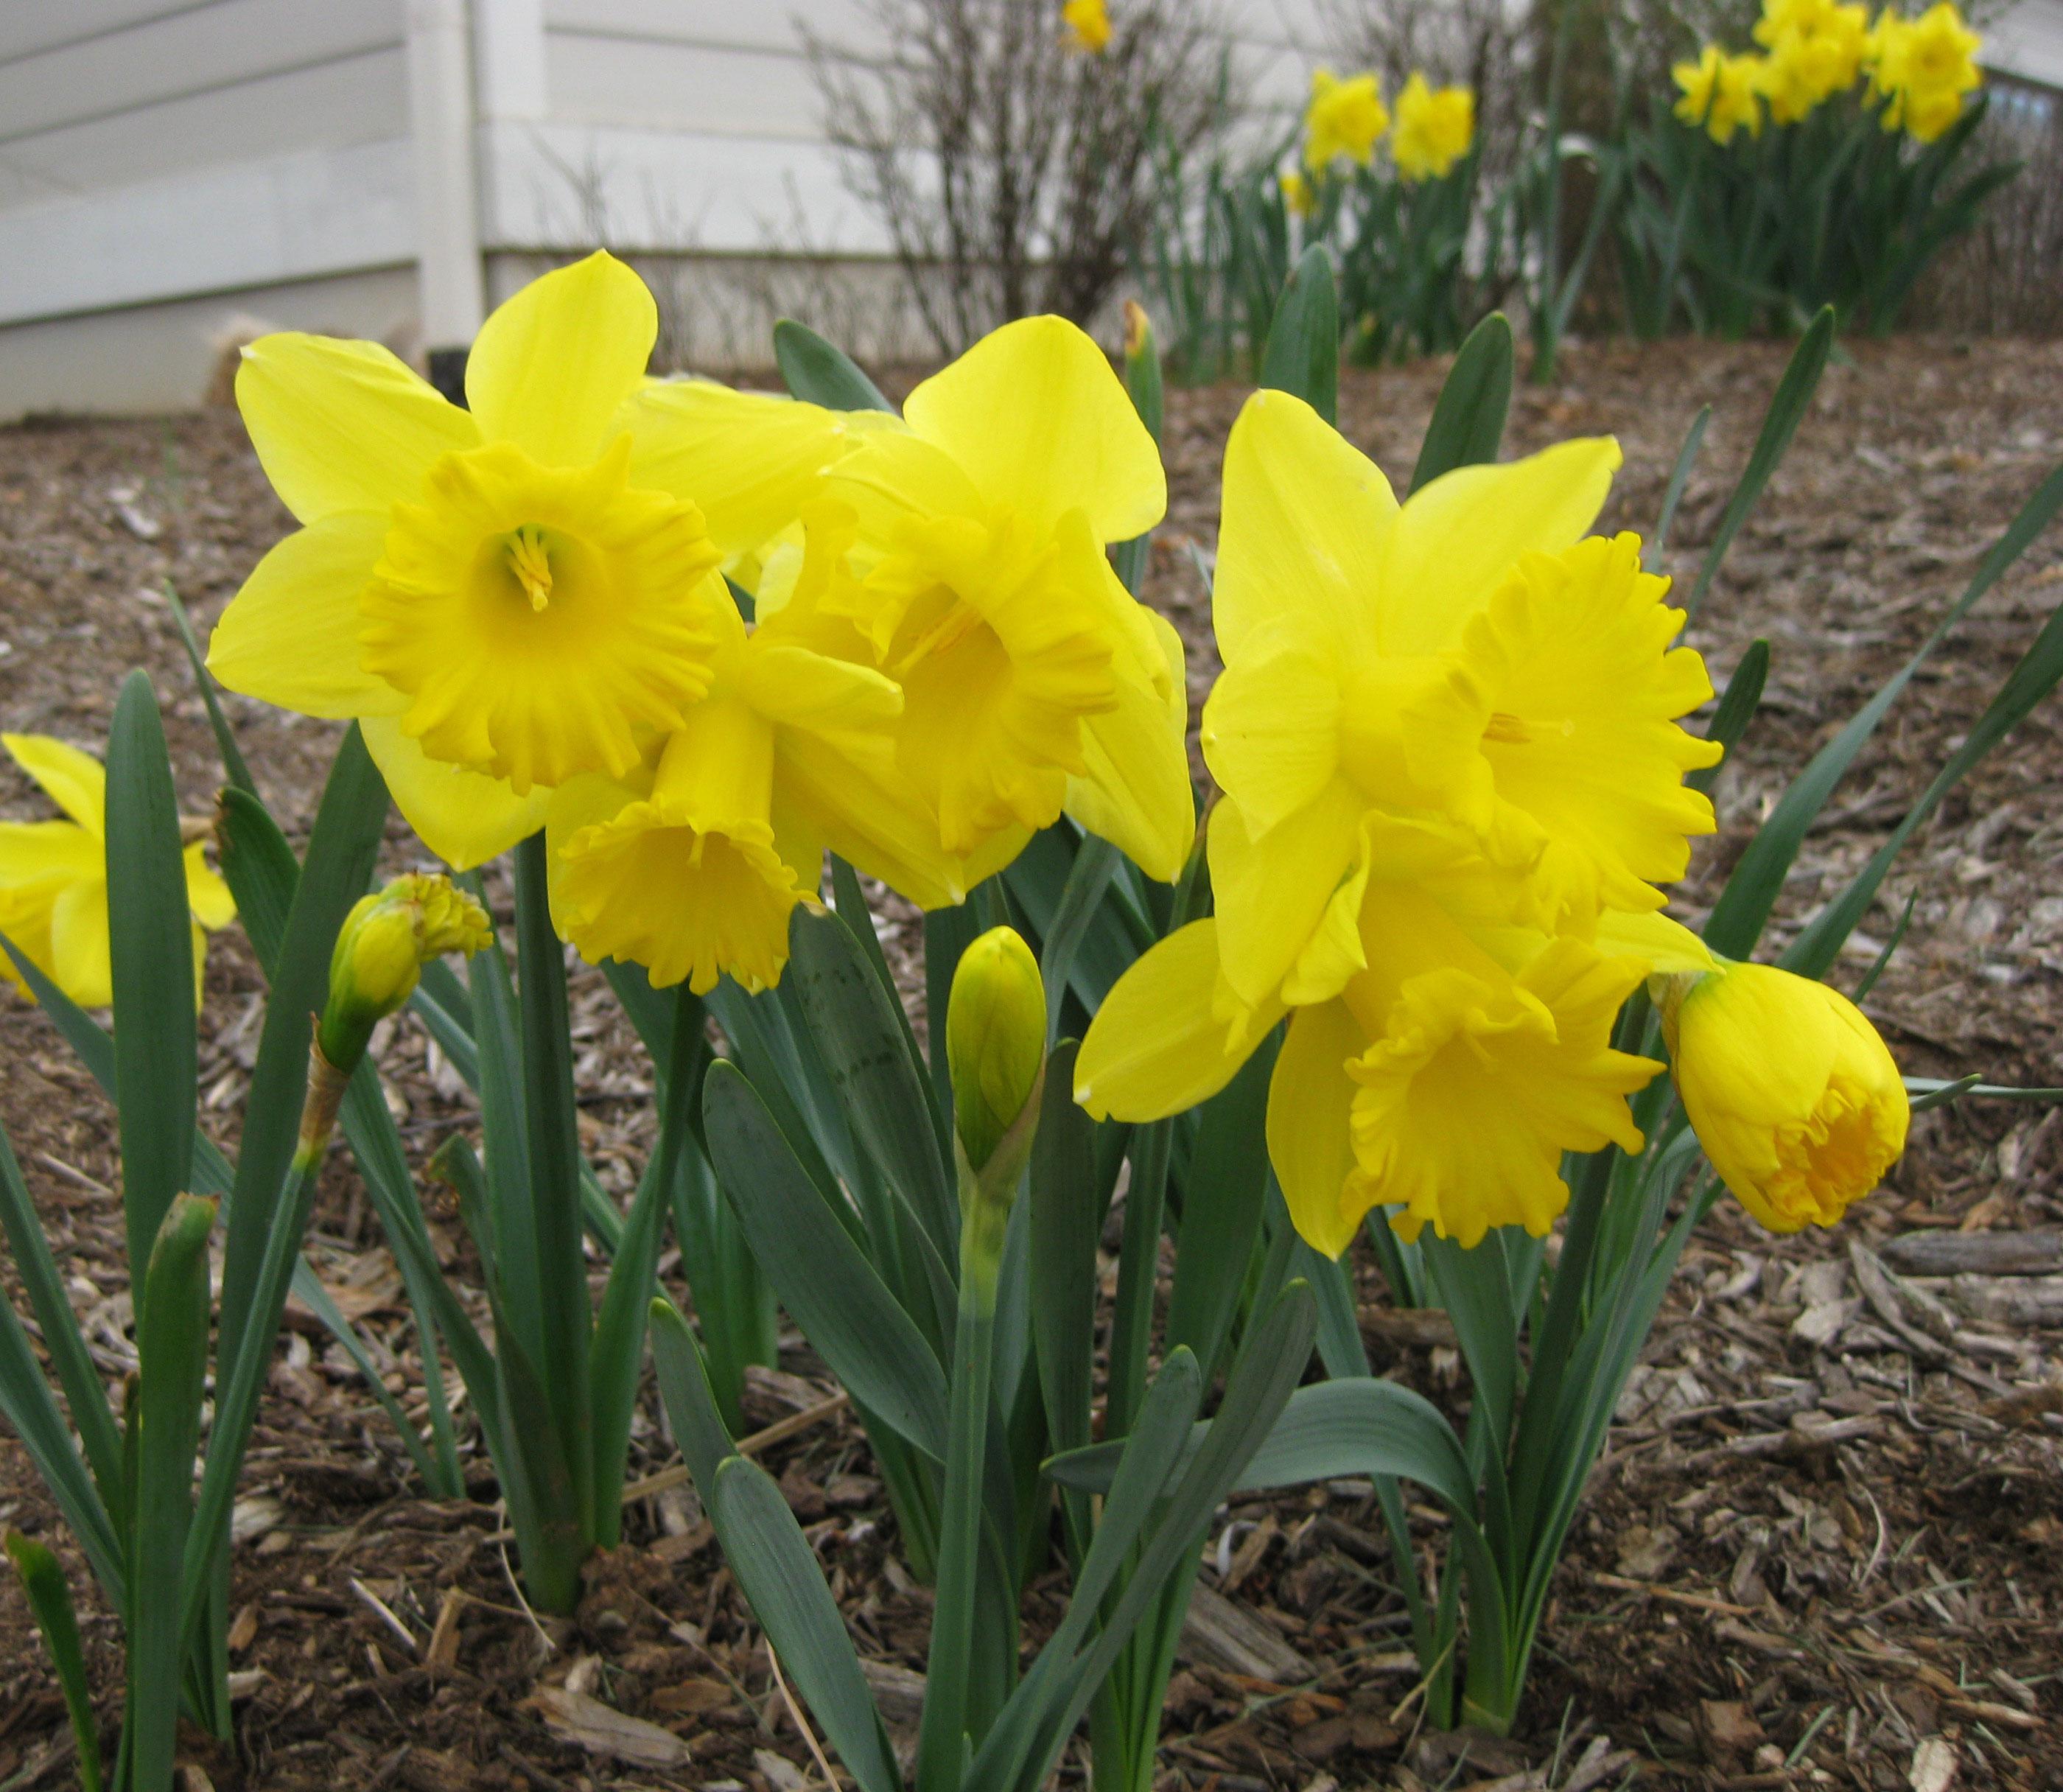 When how to plant daffodil bulbs - Daffodil Dutch Master